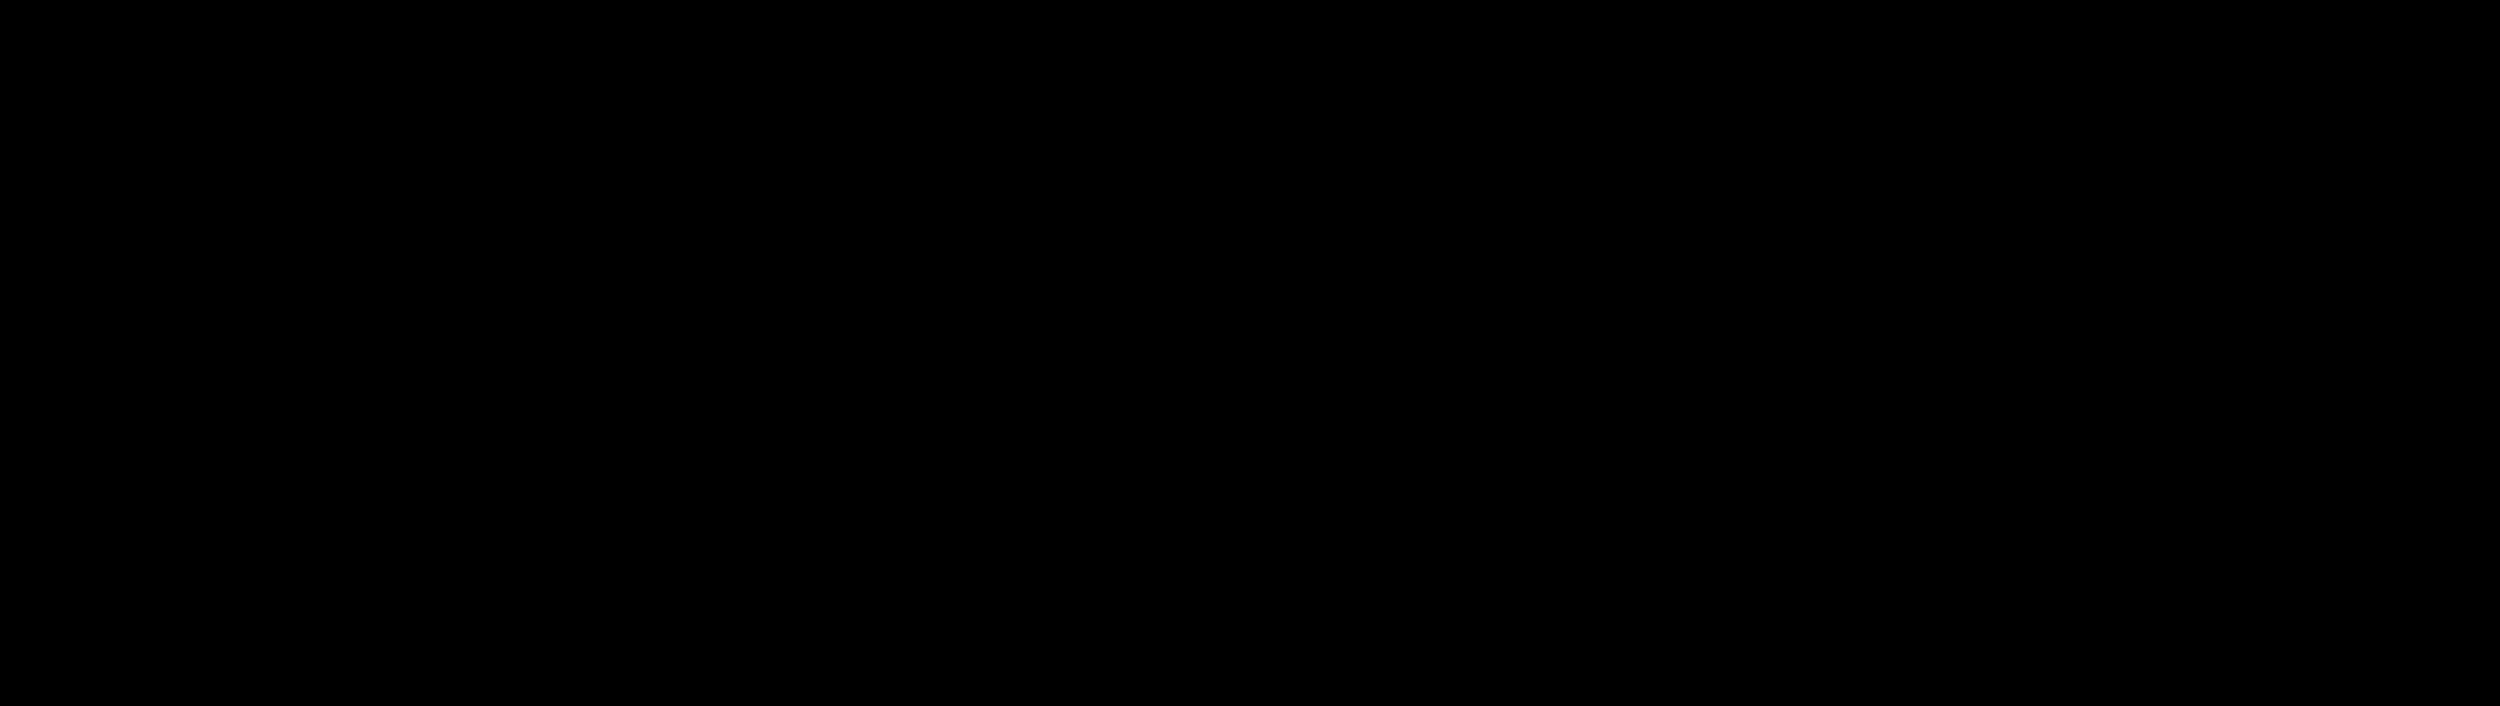 Logos Press-10.png